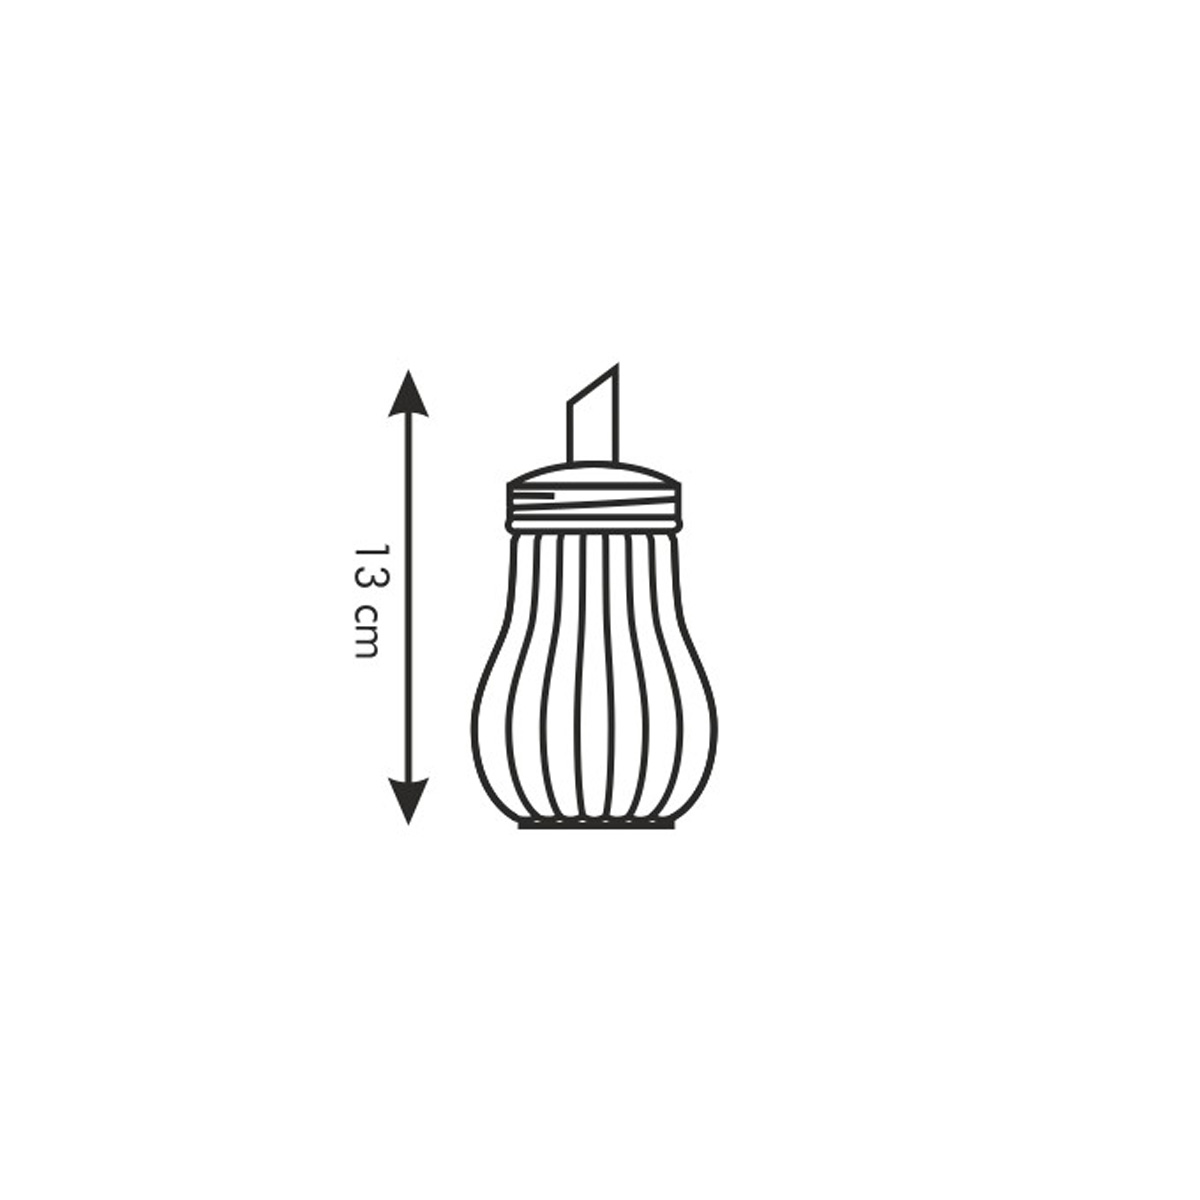 Cukřenka dávkovací CLASSIC 150 ml